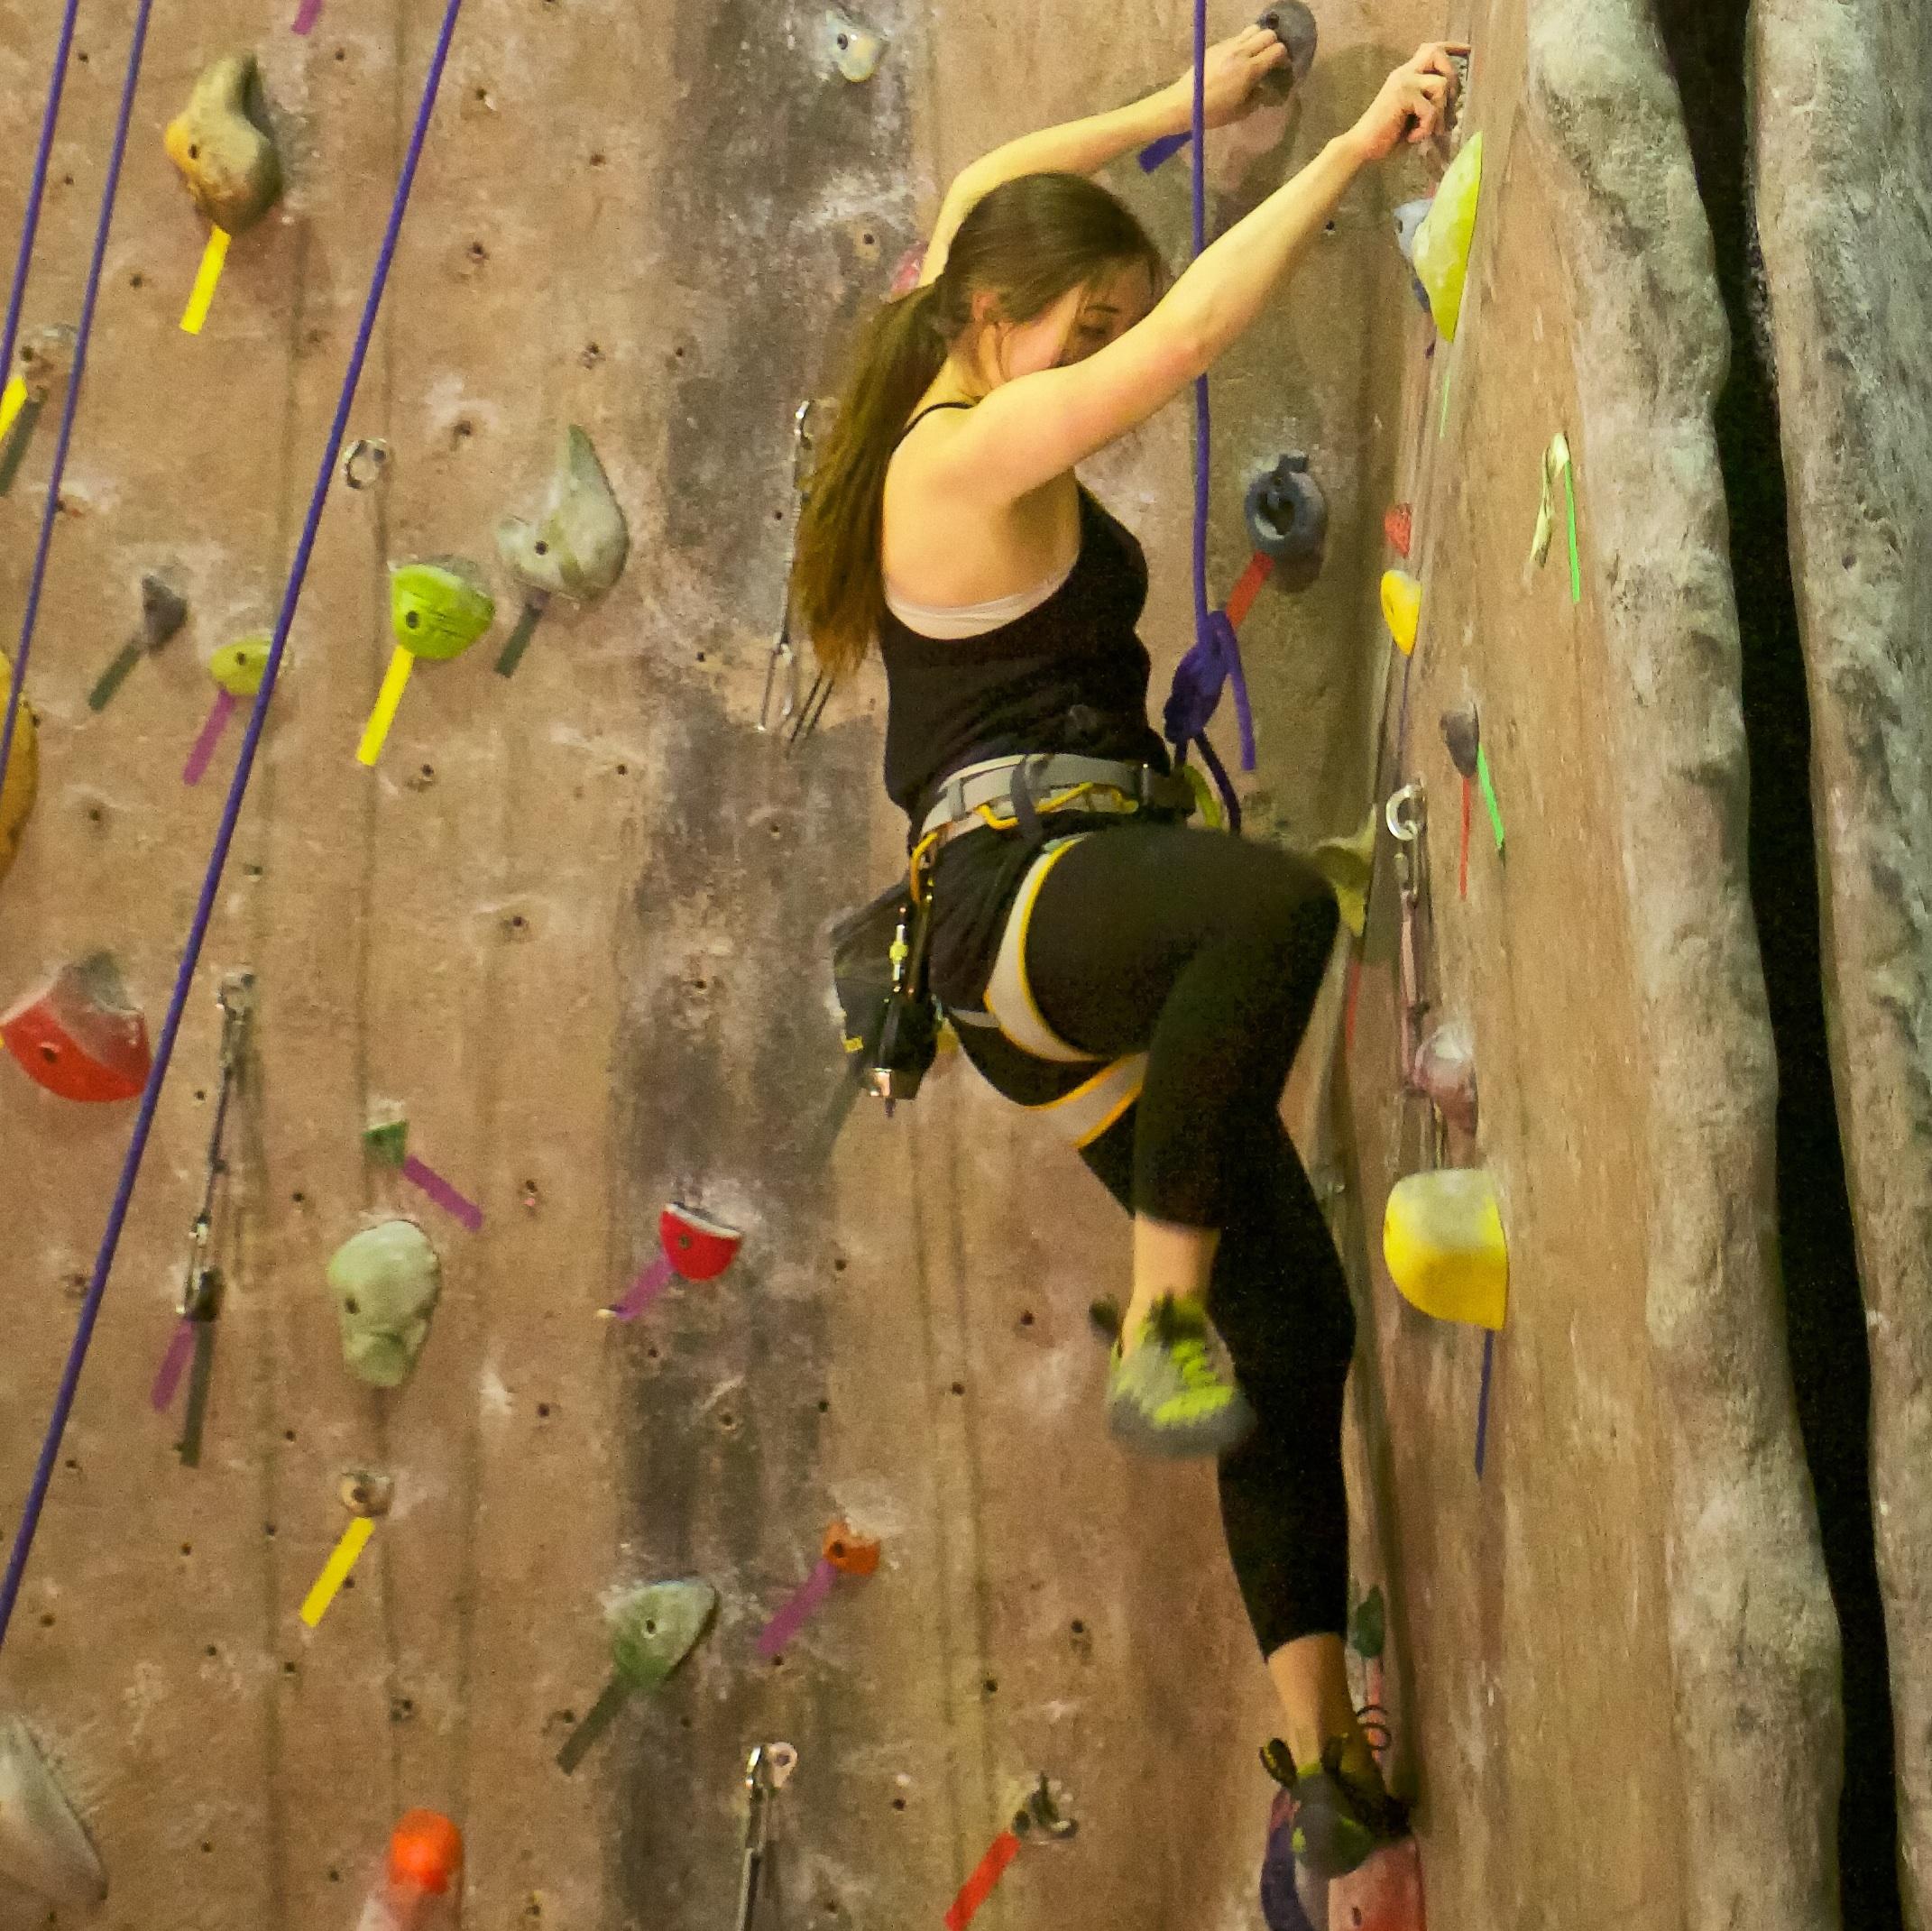 wild-walls-spokane-rock-climbing-gym